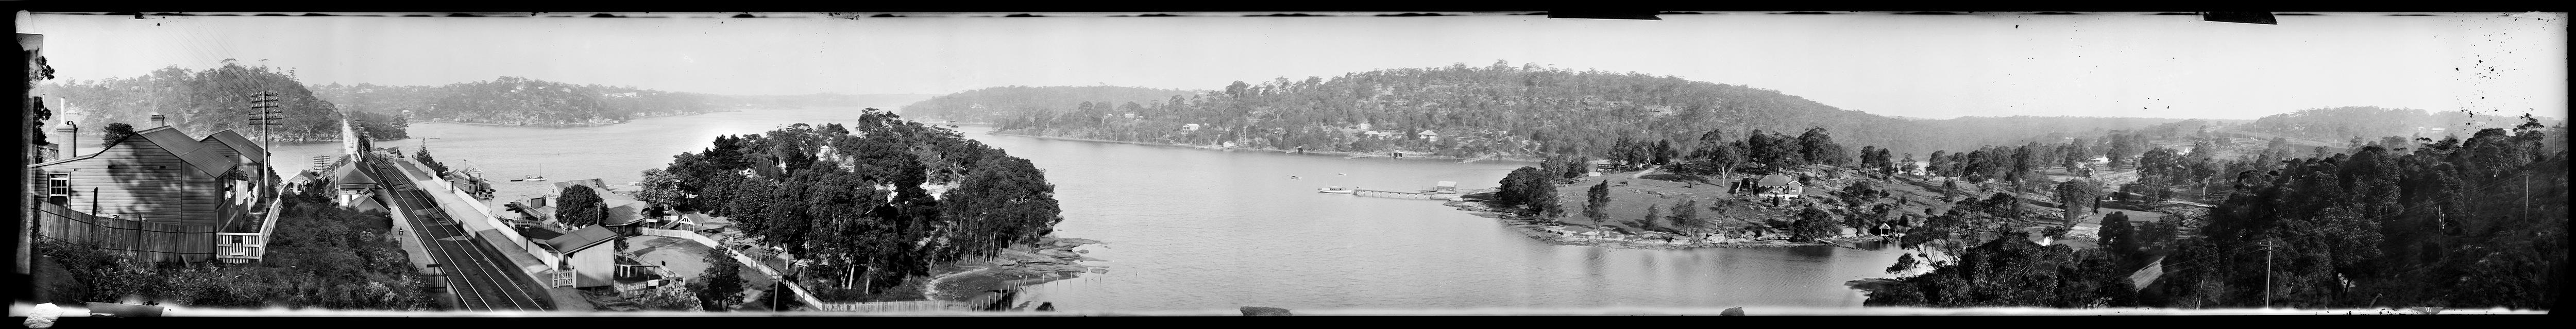 Como, Sydney, 1921-1925, by Rex Hazlewood